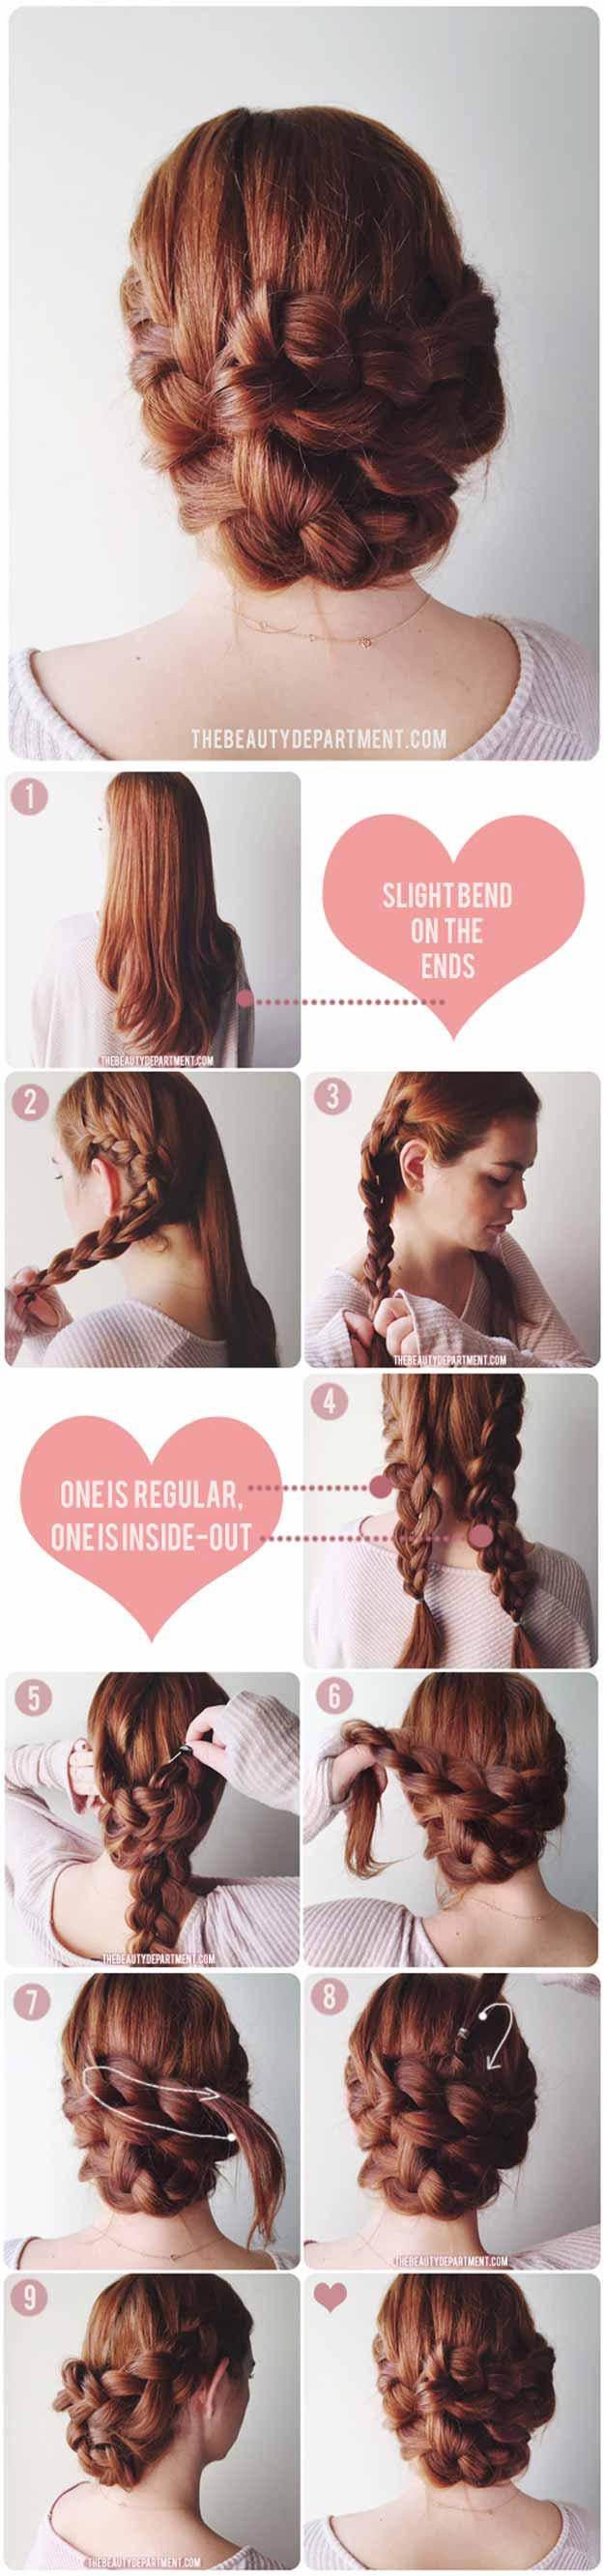 Diy Wedding Updos 31 Wedding Hairstyles For Long Hair The Goddess